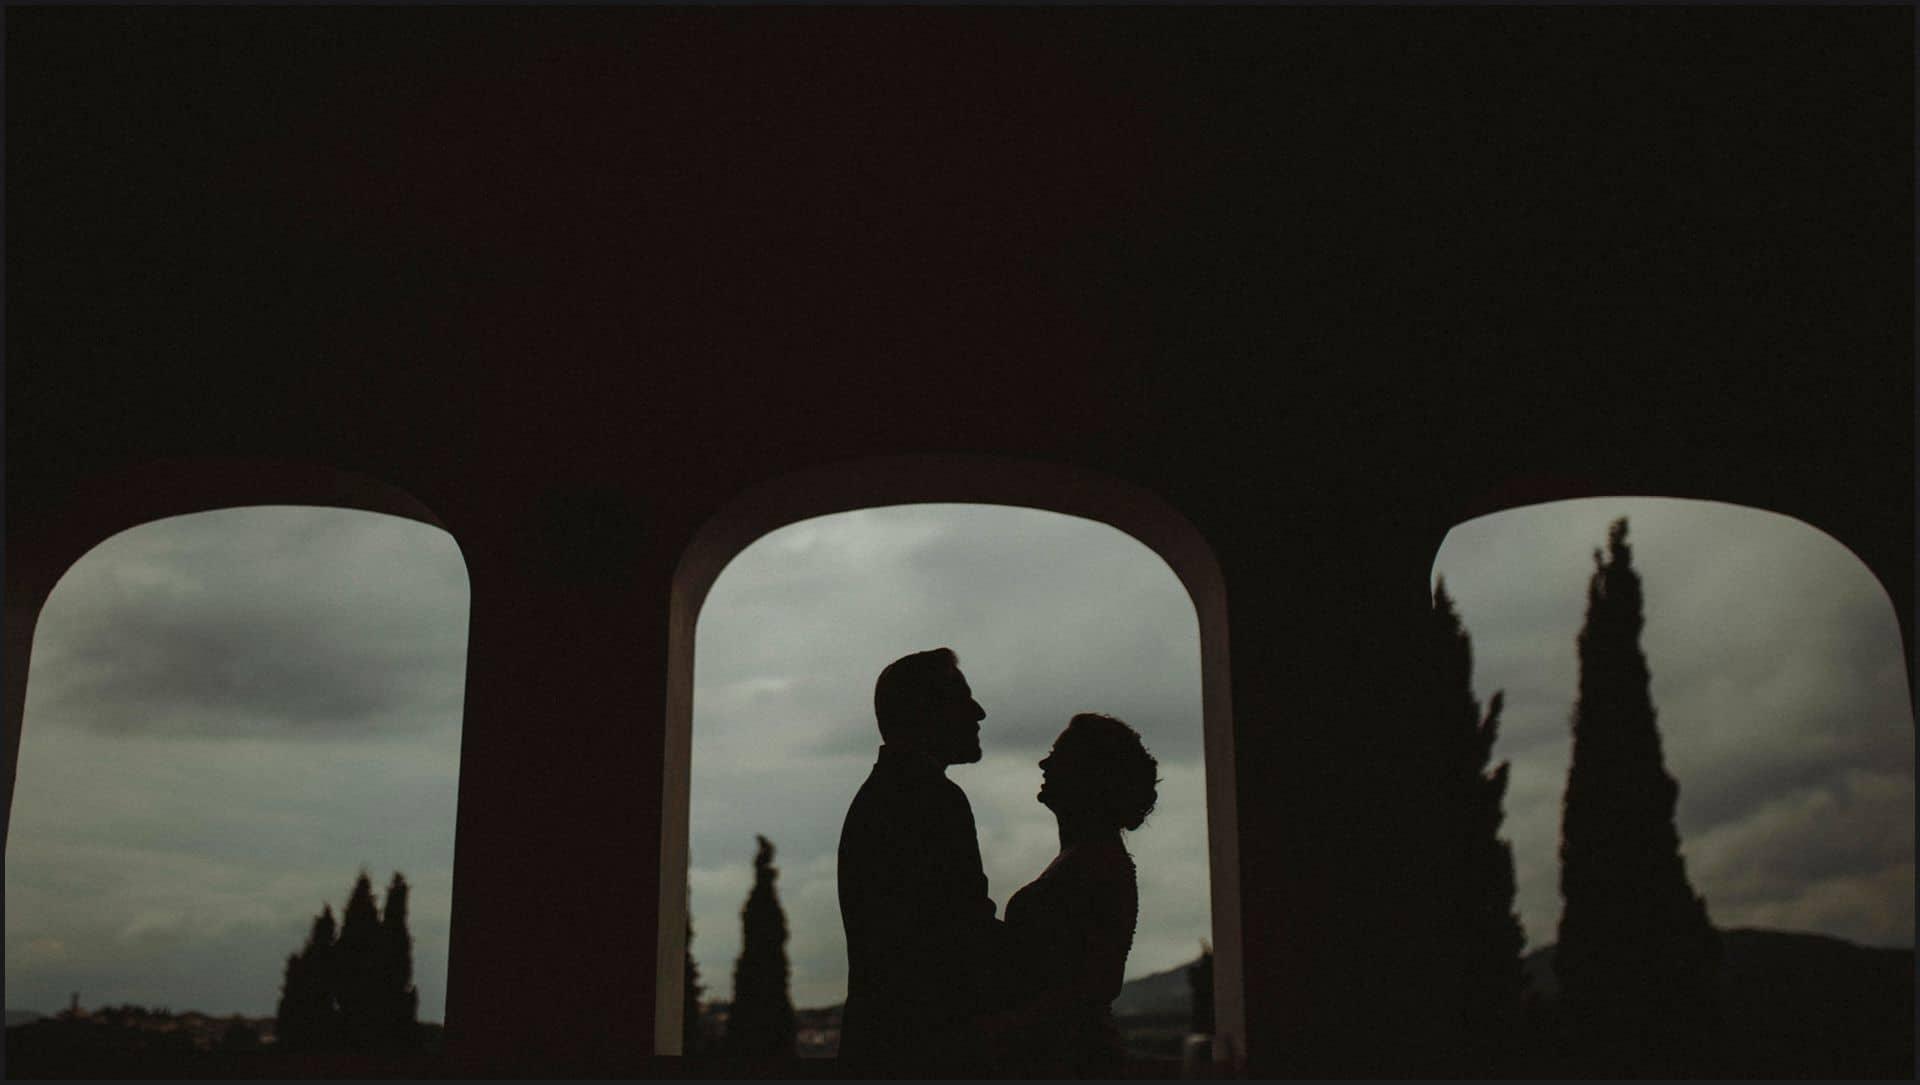 tuscany, destination wedding, chianti, bride, groom, silhouette, torre del chianti